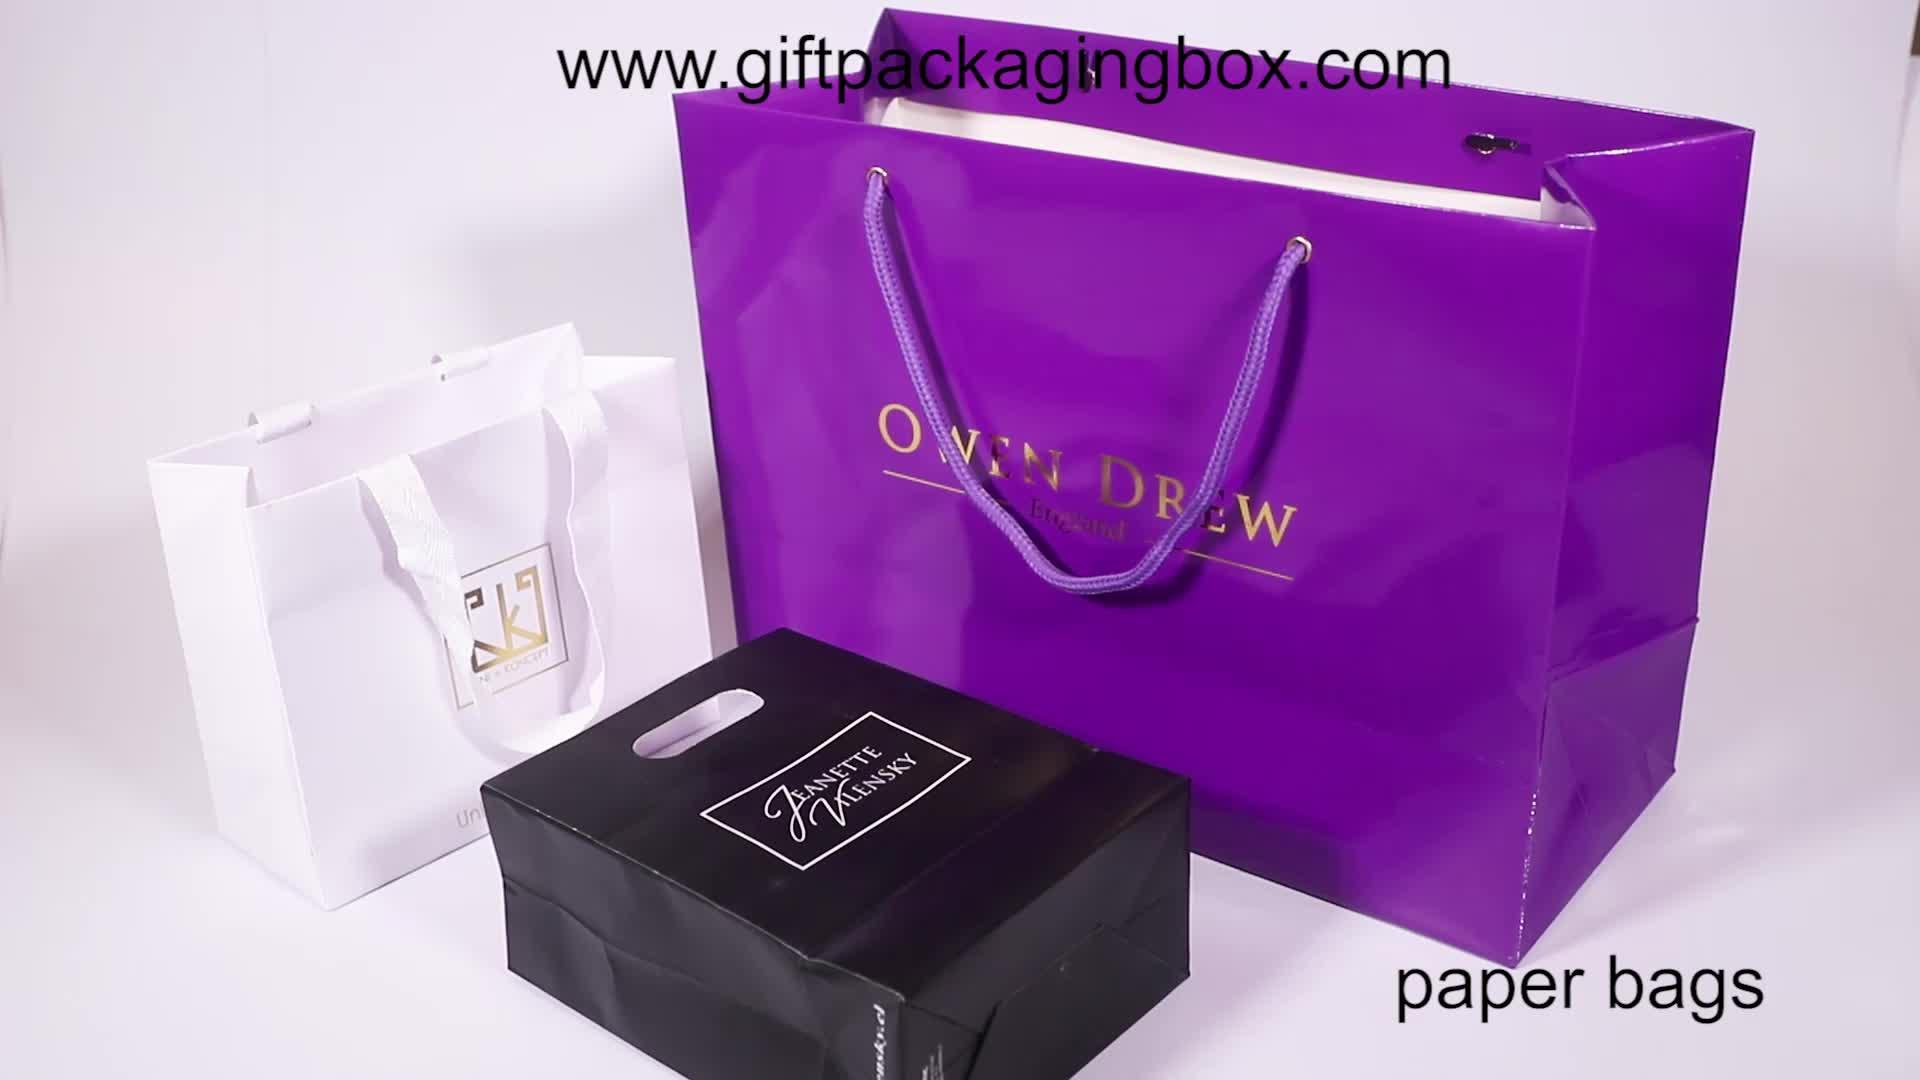 Werbe-Custom-Logo gedruckt Verpackung Luxus-Shopping-Geschenk-Papiertüte